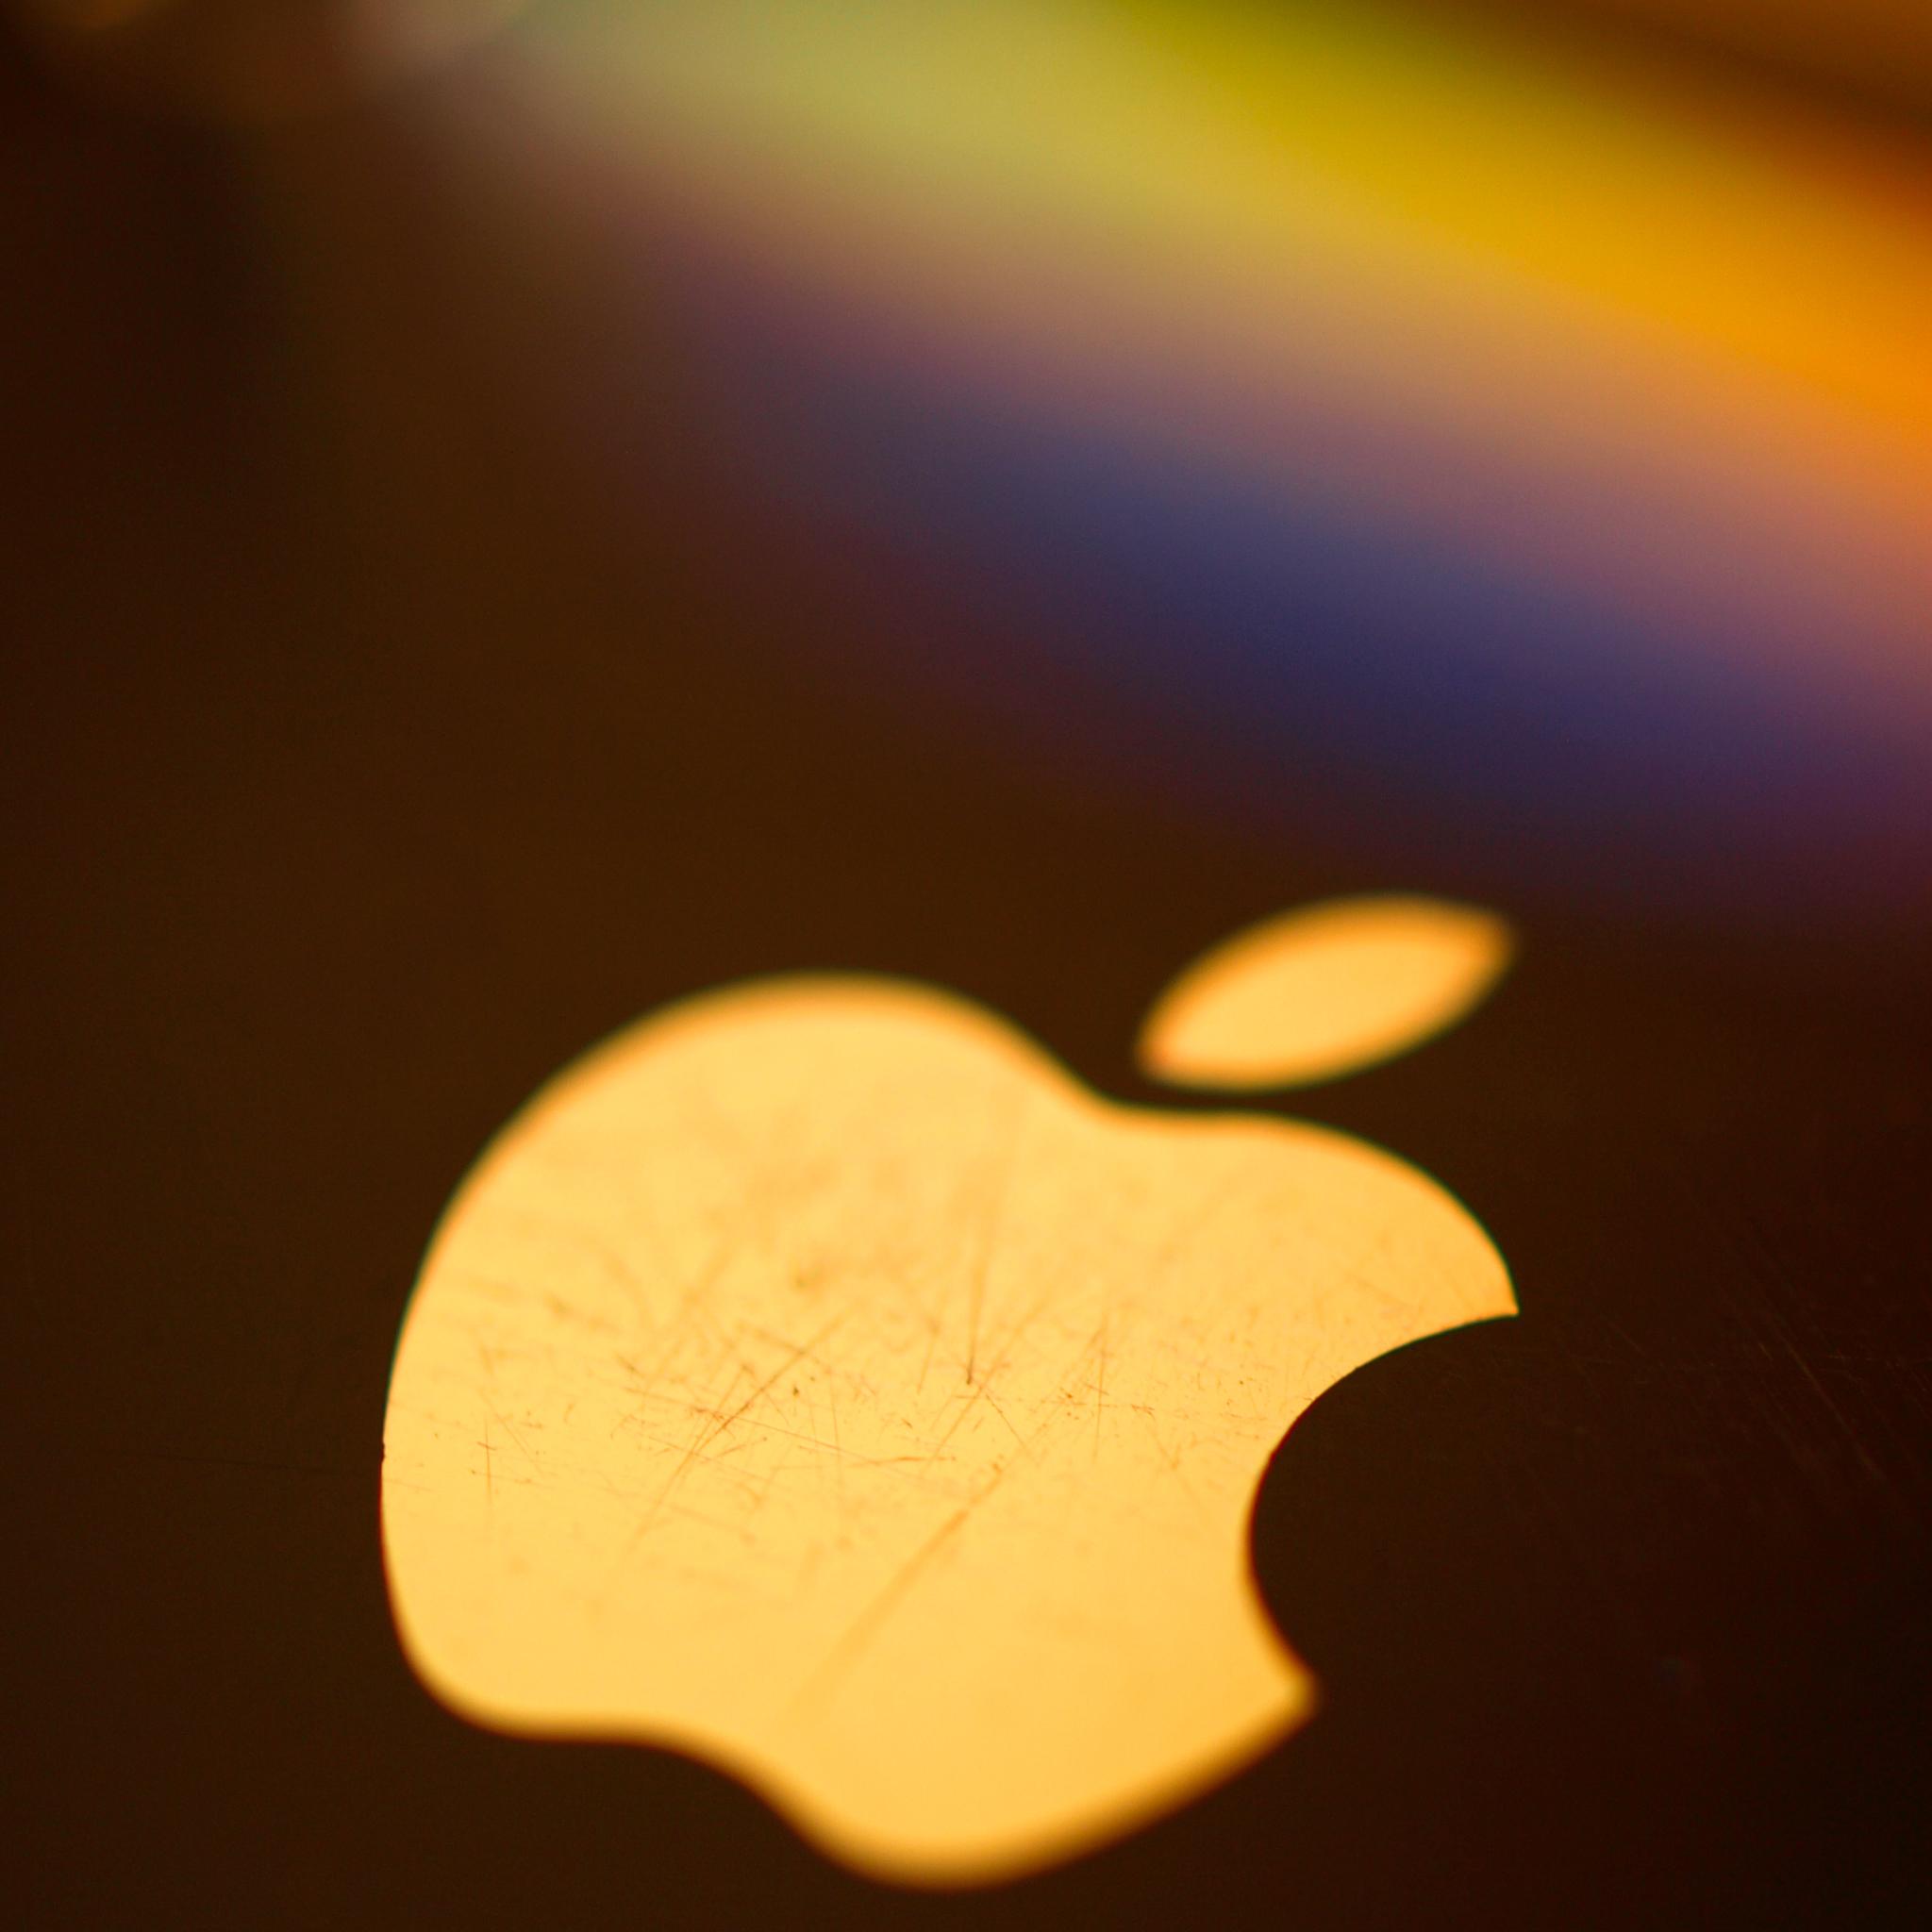 Apple_Draw_3Wallpapers_iPad